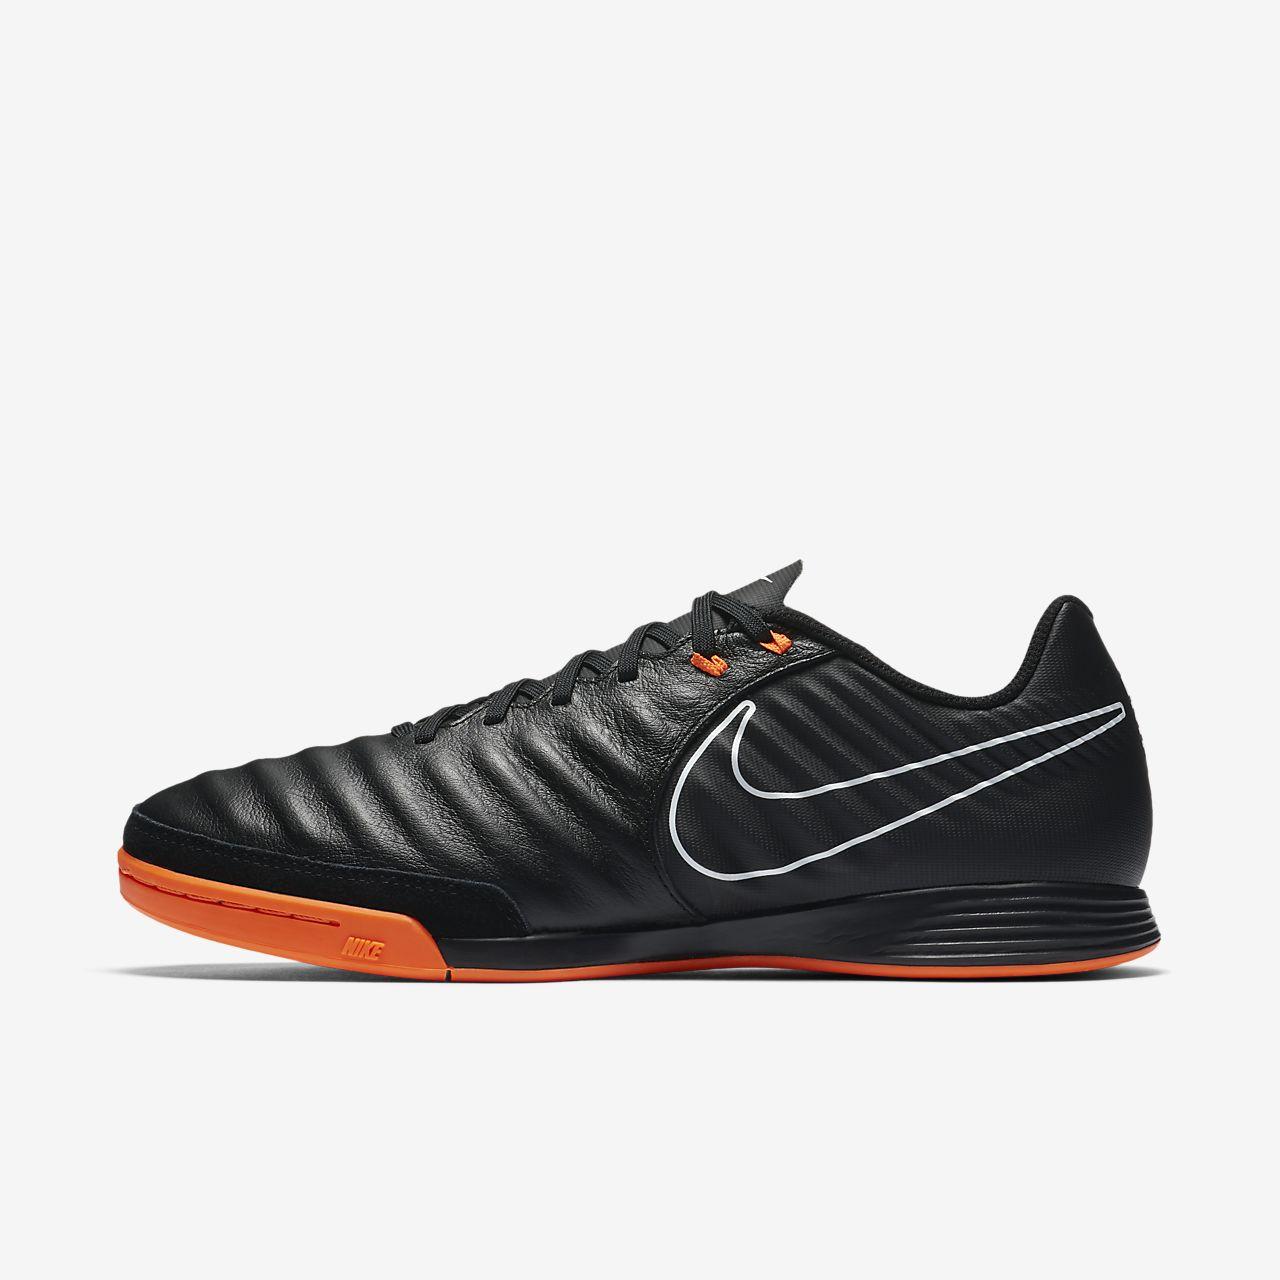 ... Nike TiempoX Legend VII Academy Indoor/Court Football Shoe